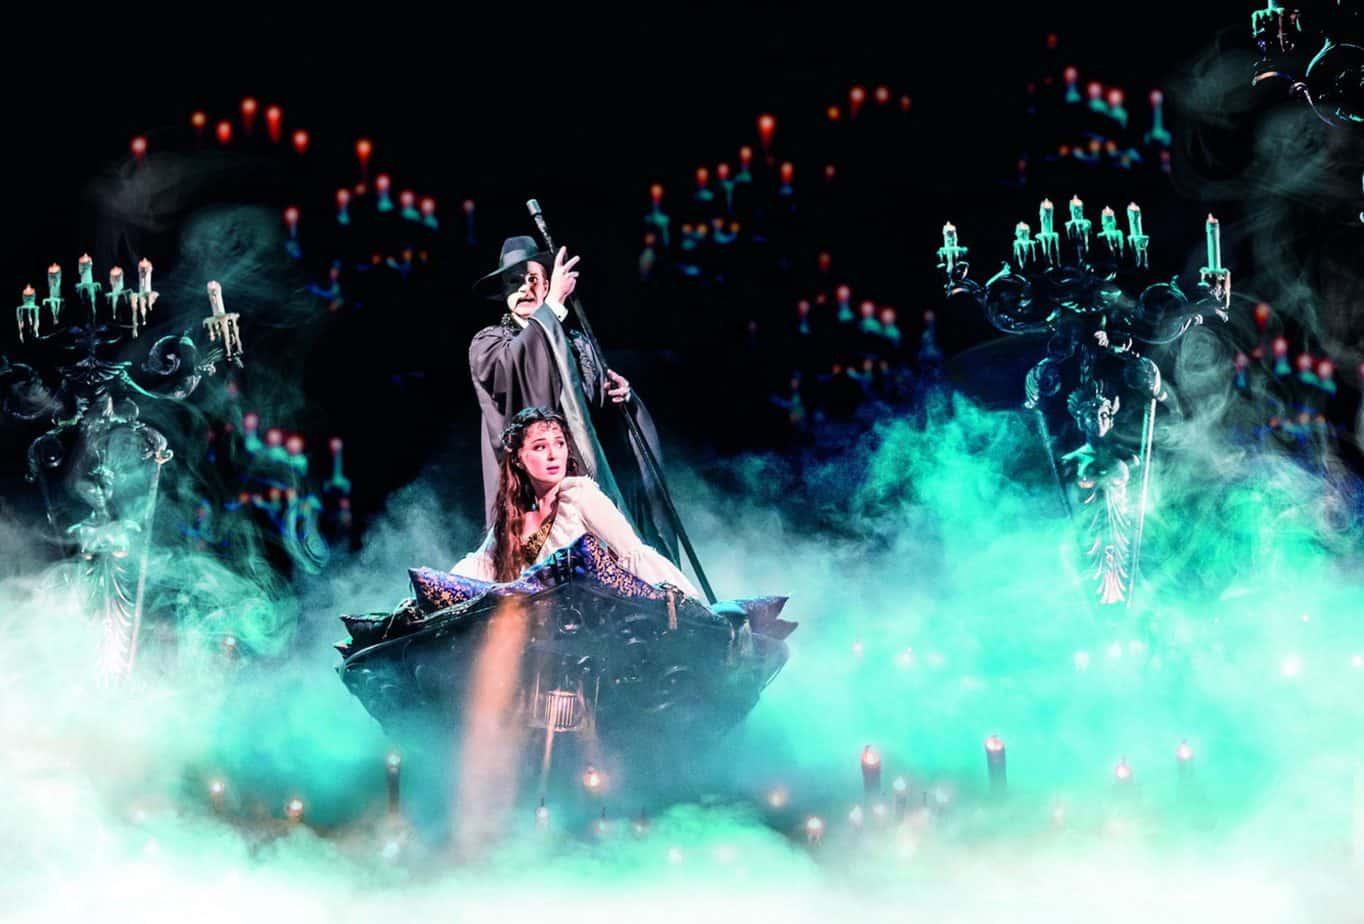 3.-THE-PHANTOM-OF-THE-OPERA.-Ben-Lewis-'The-Phantom'-and-Kelly-Mathieson...